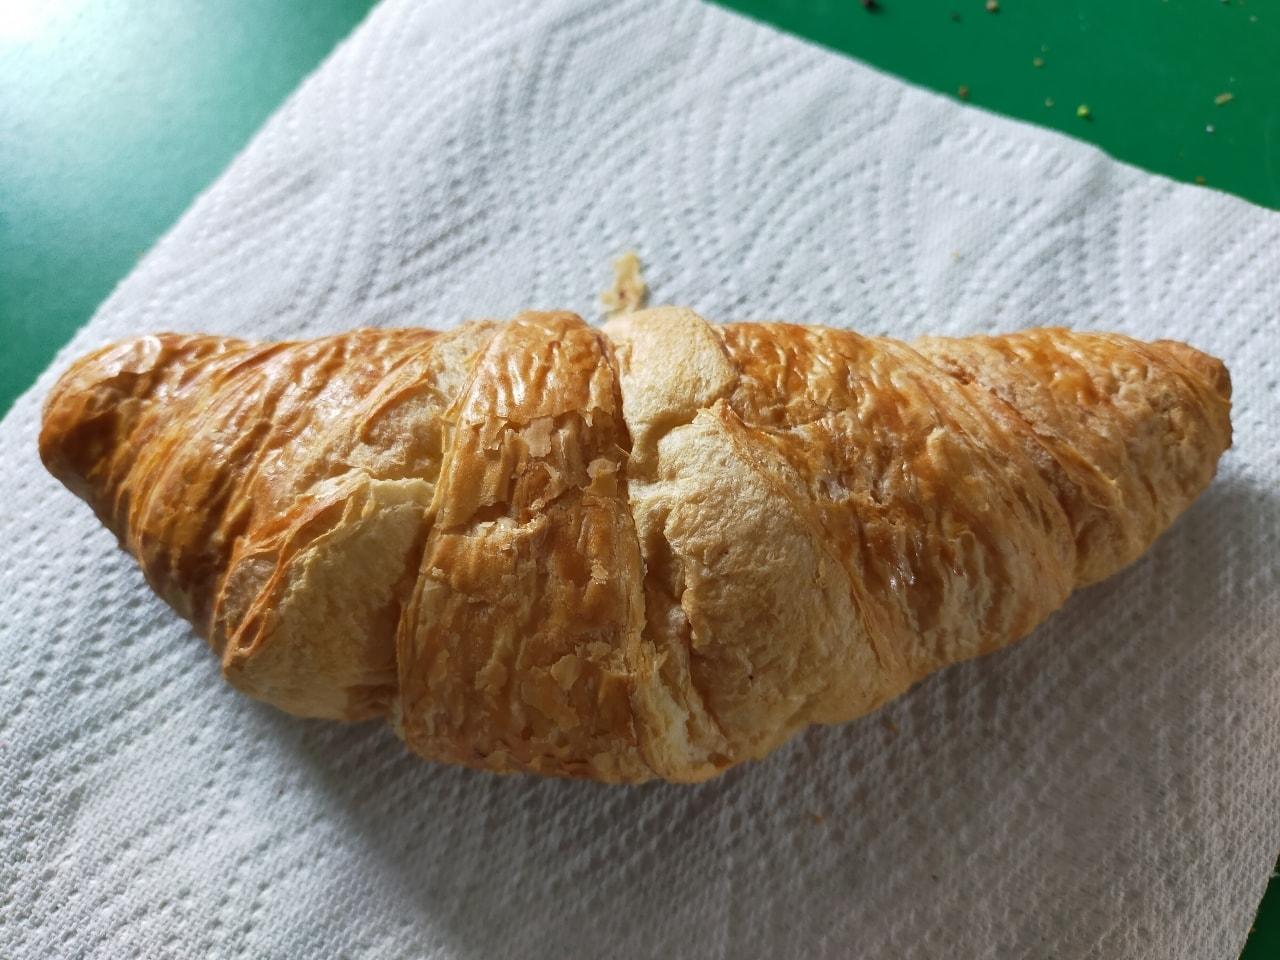 Tesco in-store bakery plain croissants X 2